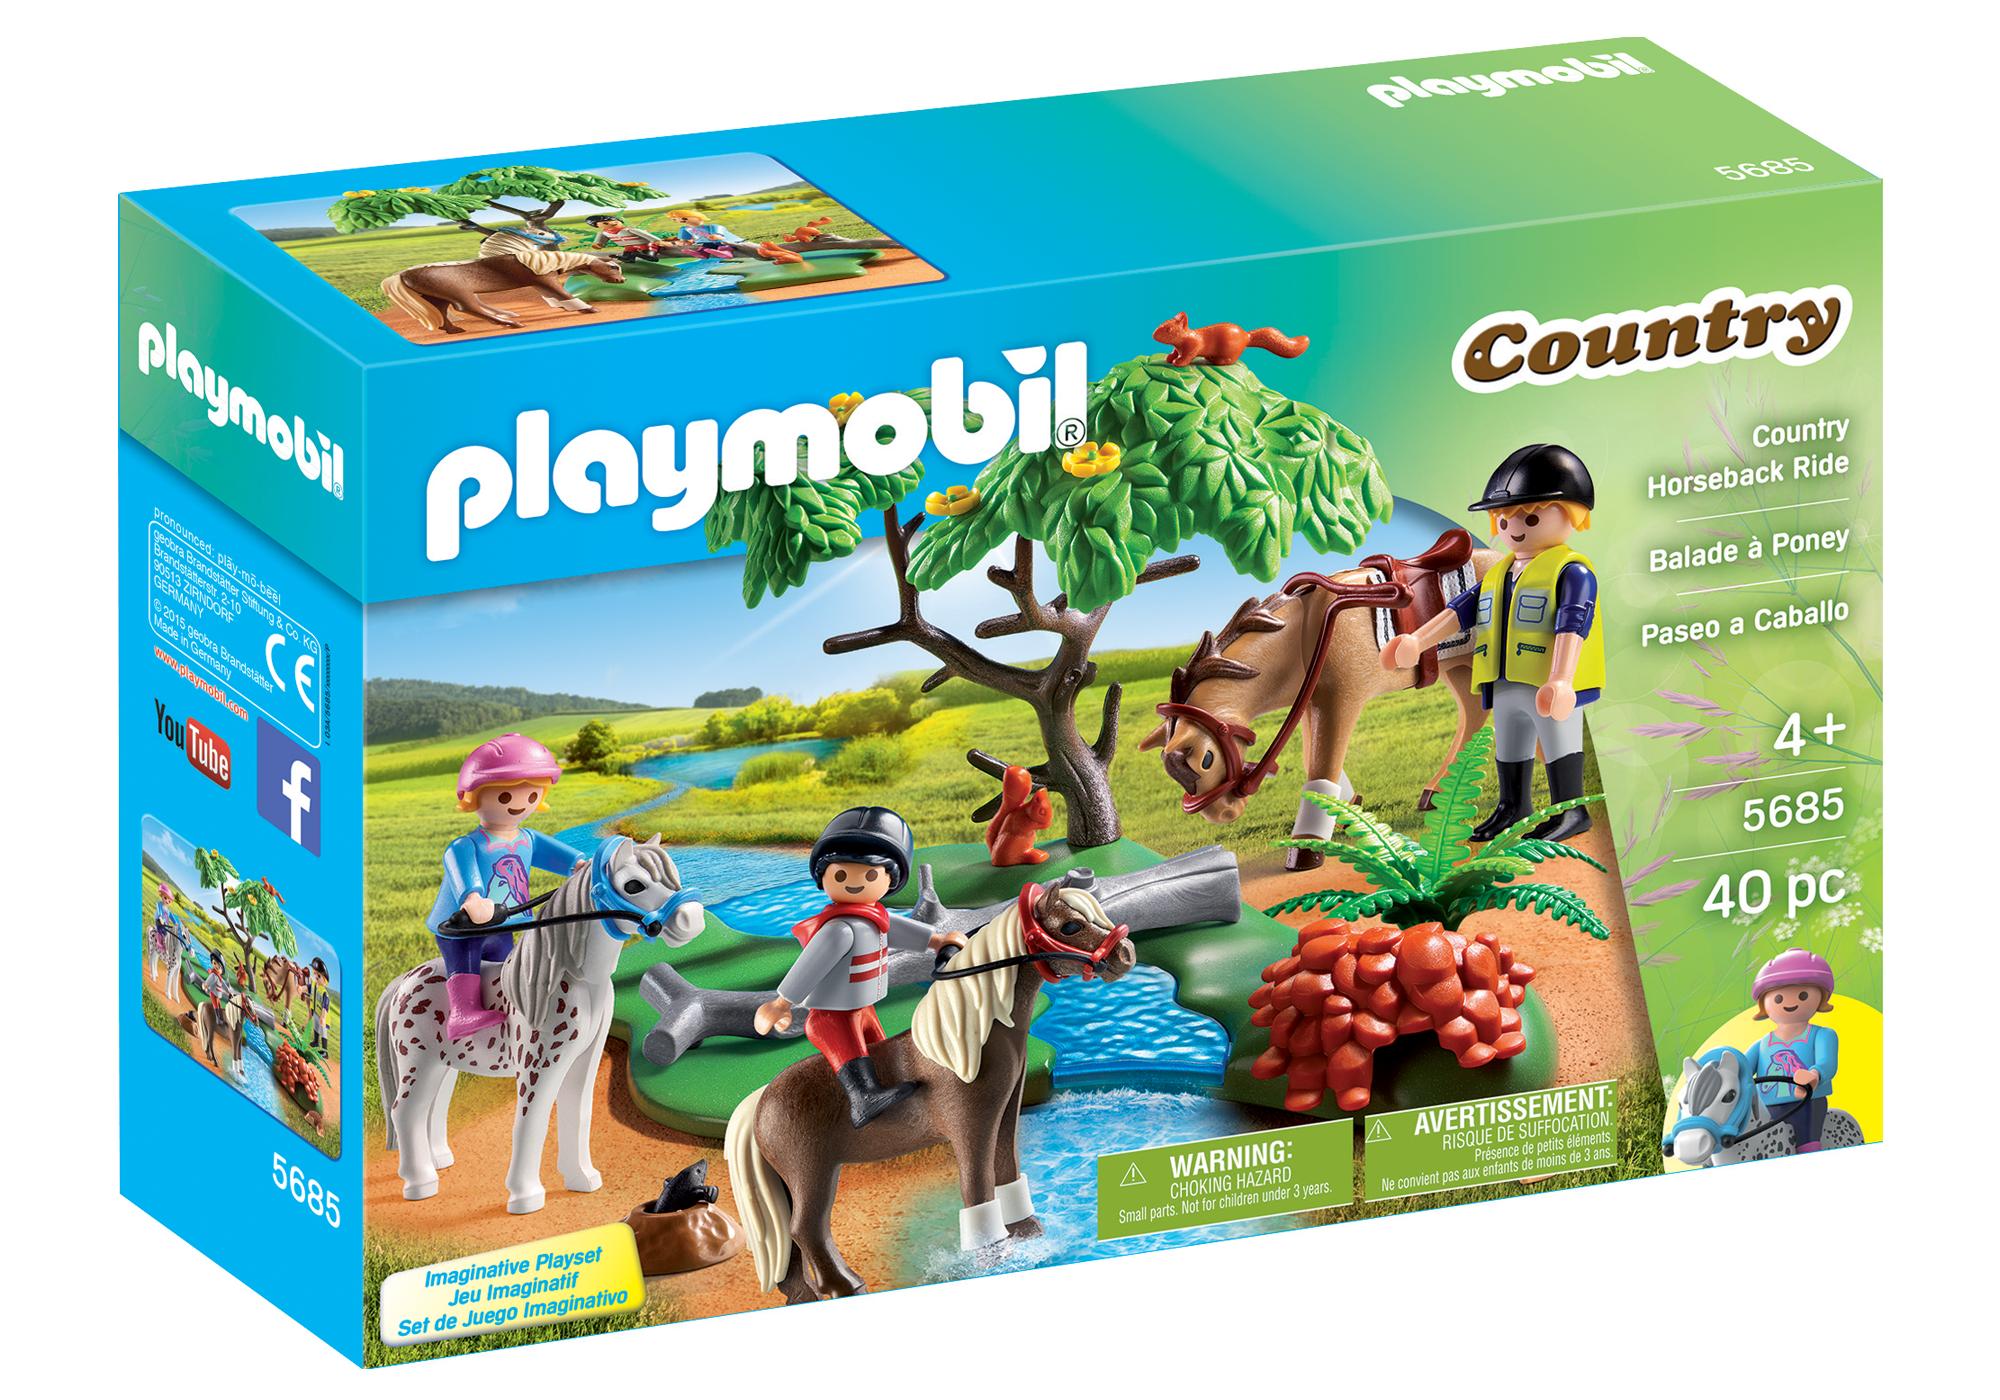 http://media.playmobil.com/i/playmobil/5685_product_box_front/Country Horseback Ride